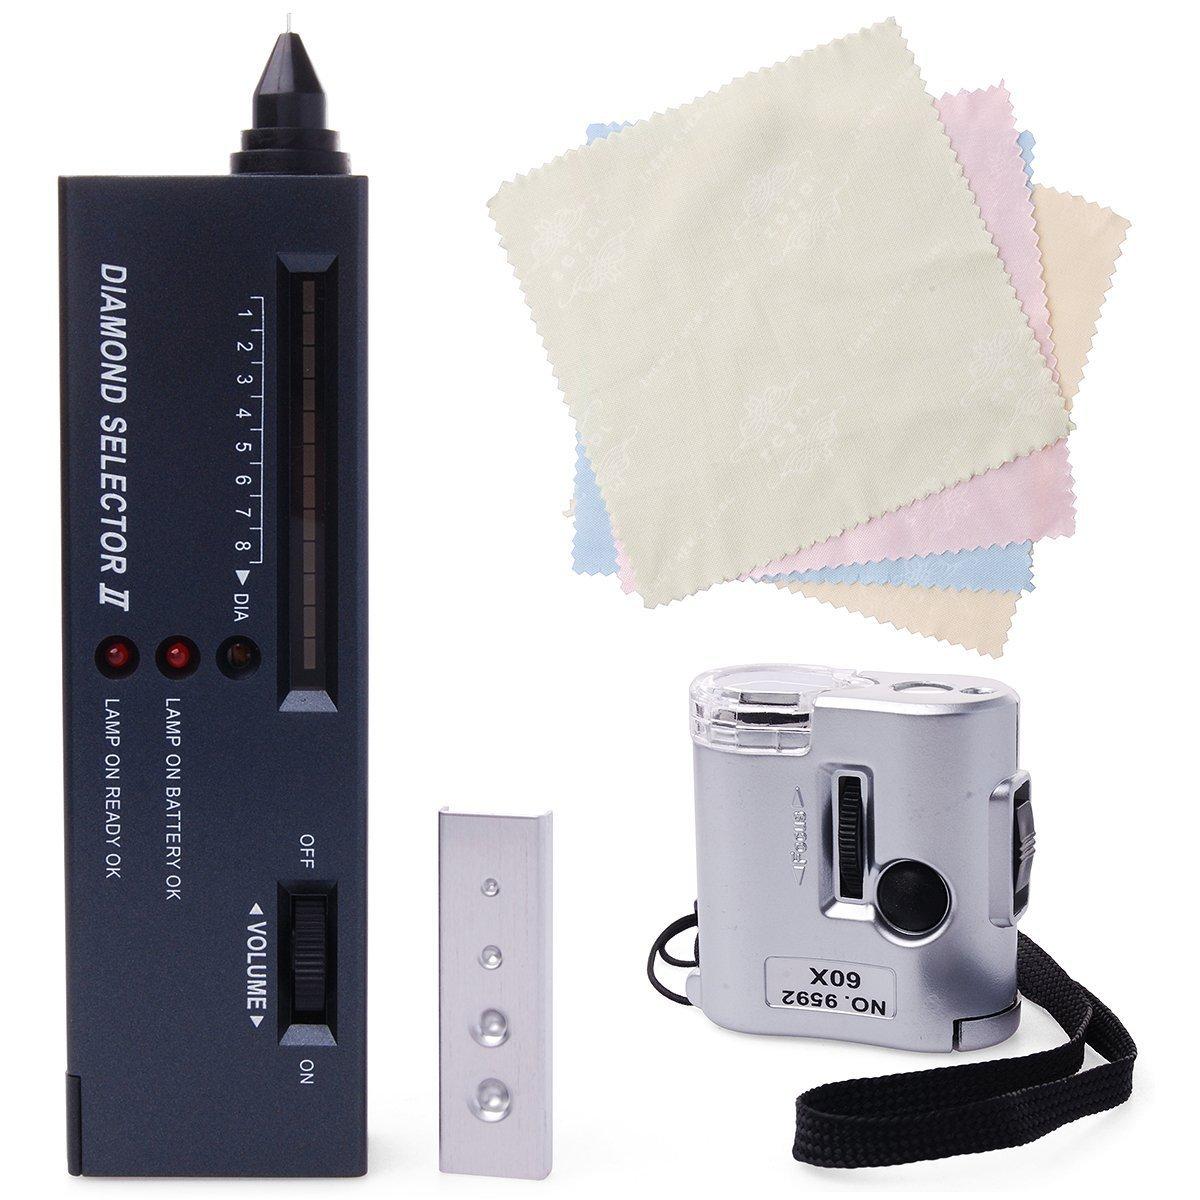 60X LED Loupe QUMOX Portable Diamond Selector II V2 Gemstone Tester Tool